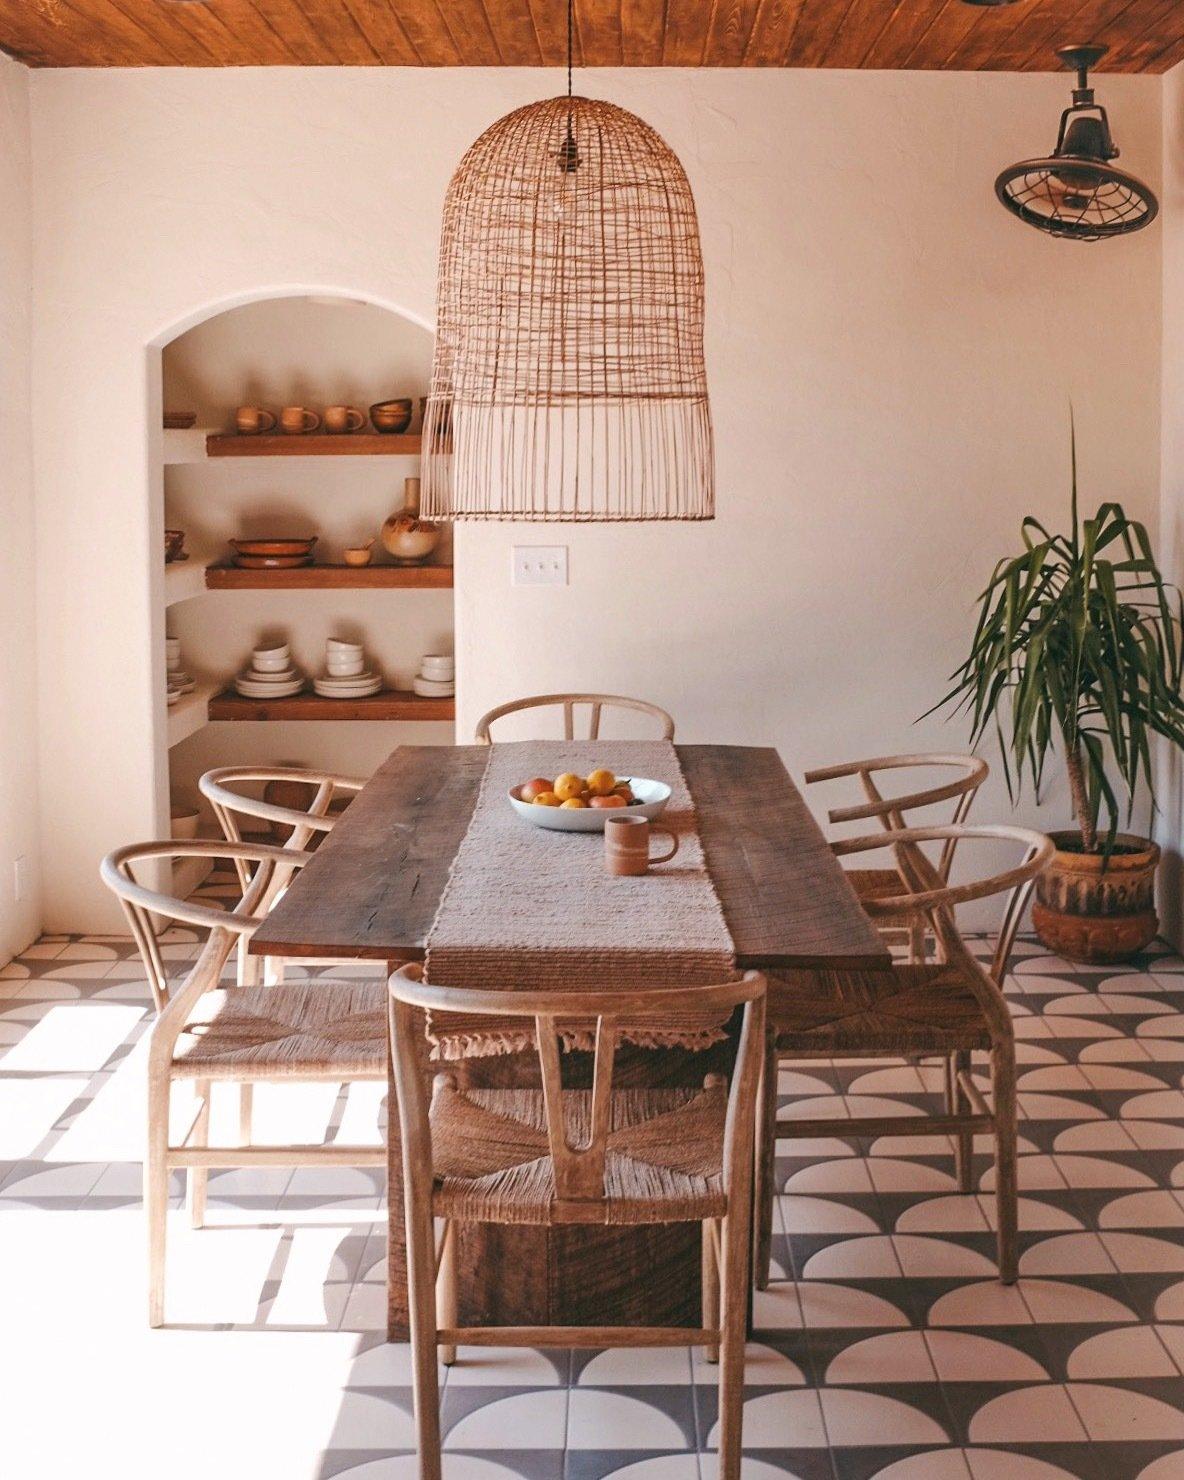 The Posada Sara and Rich Combs dining room